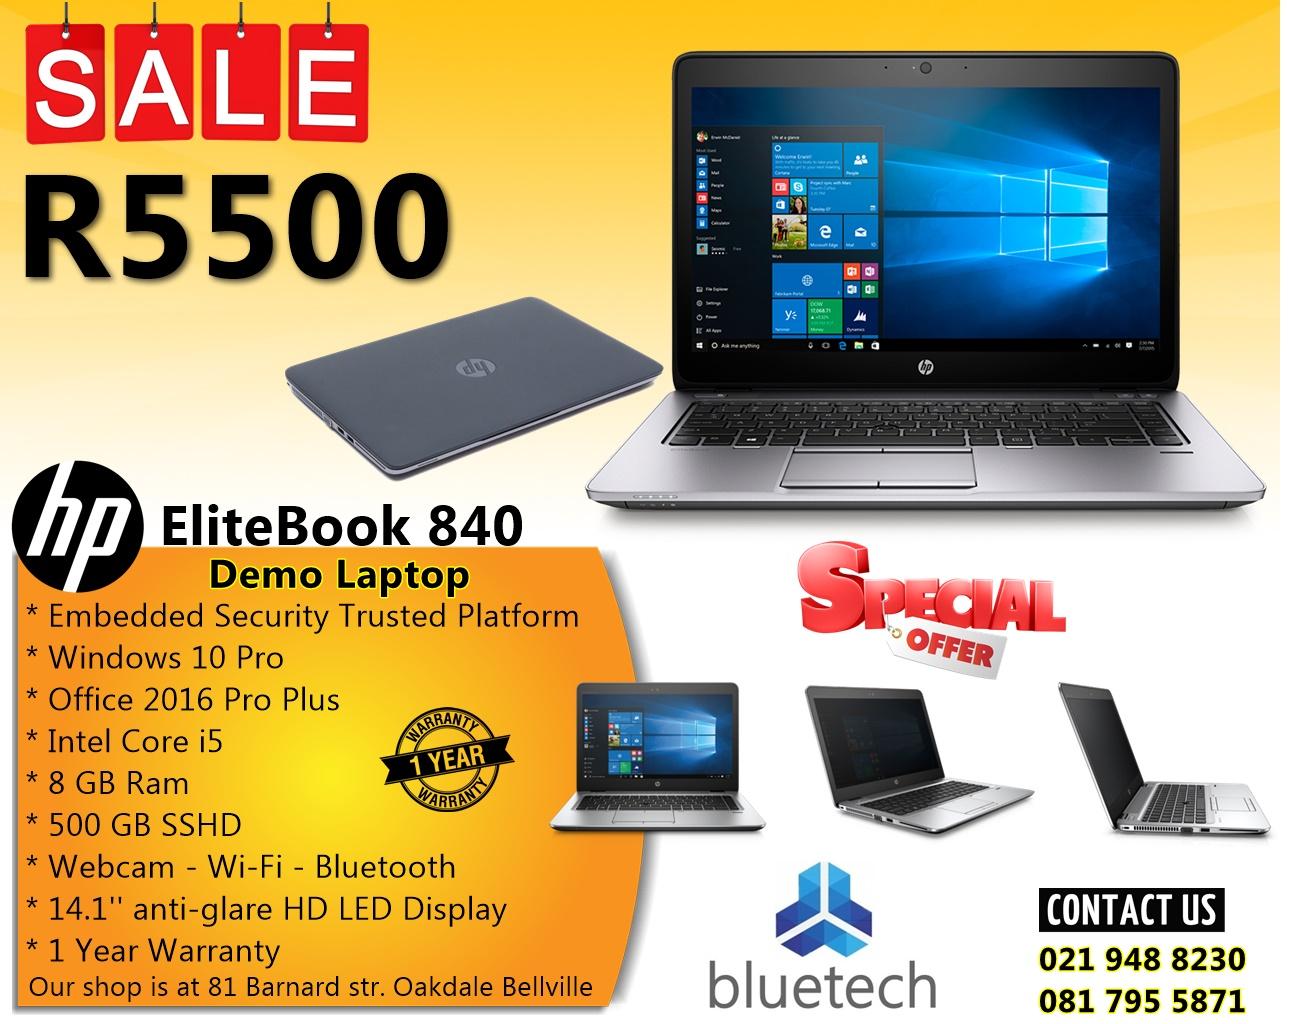 "Demo HP EliteBook 840  - 14"" HD Screen - Core i5  - 8GB RAM - 500GB SSHD – Bluetech 0219488230"